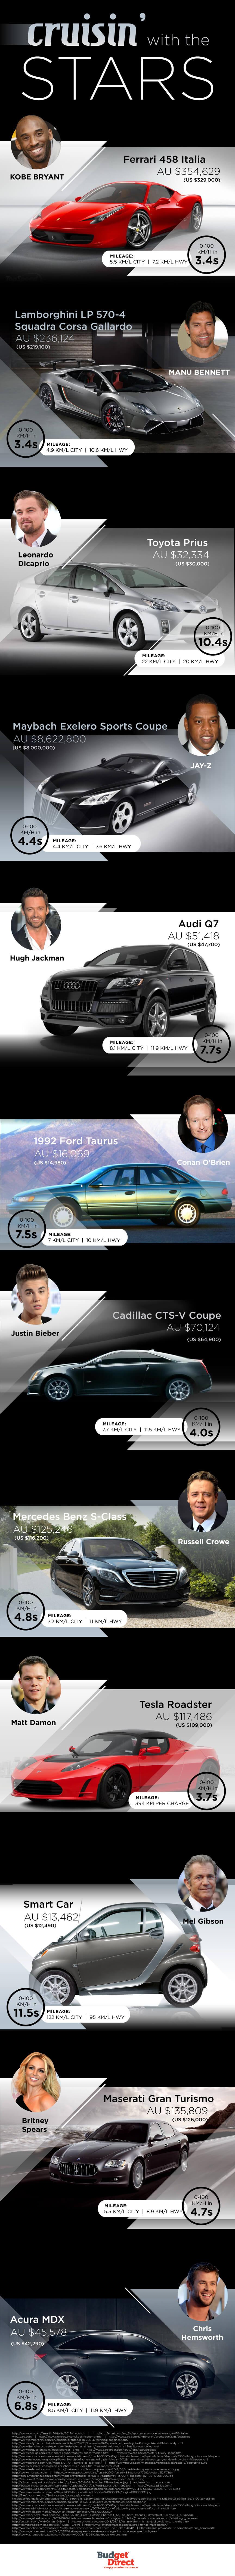 Celebrities-cars-8